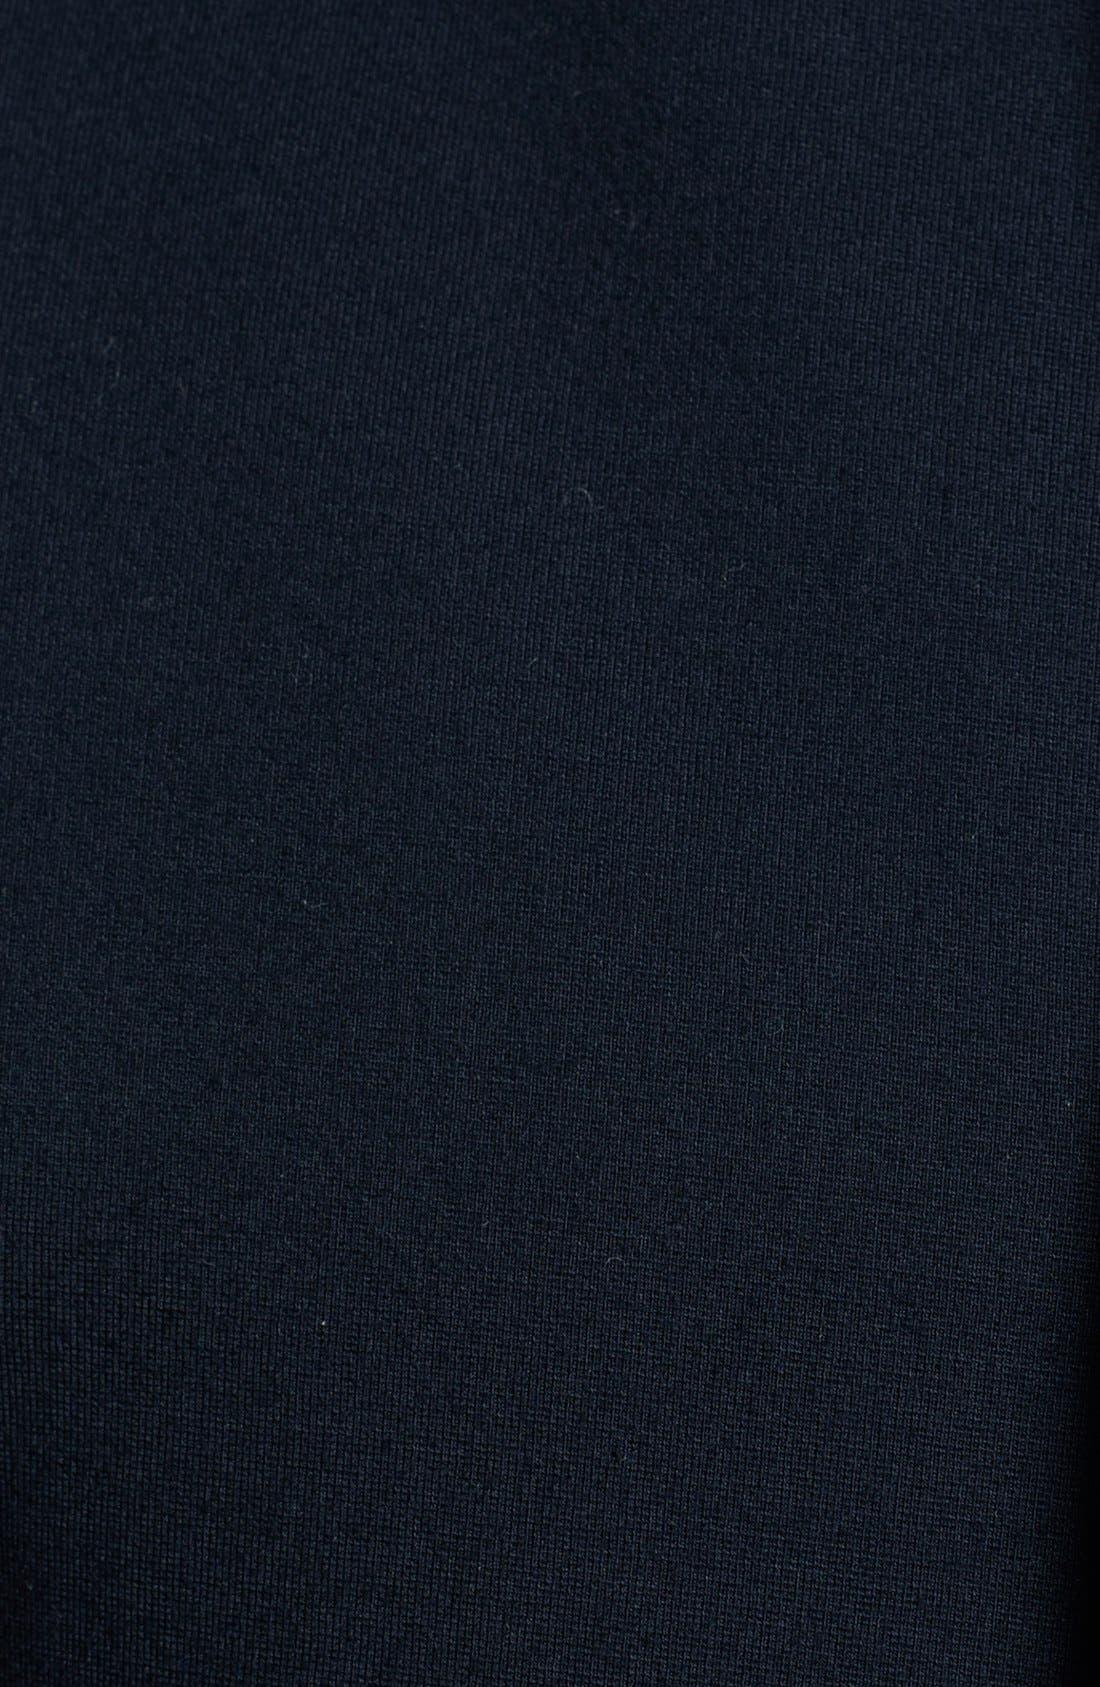 Alternate Image 3  - Armani Collezioni Ponte Neru Jacket